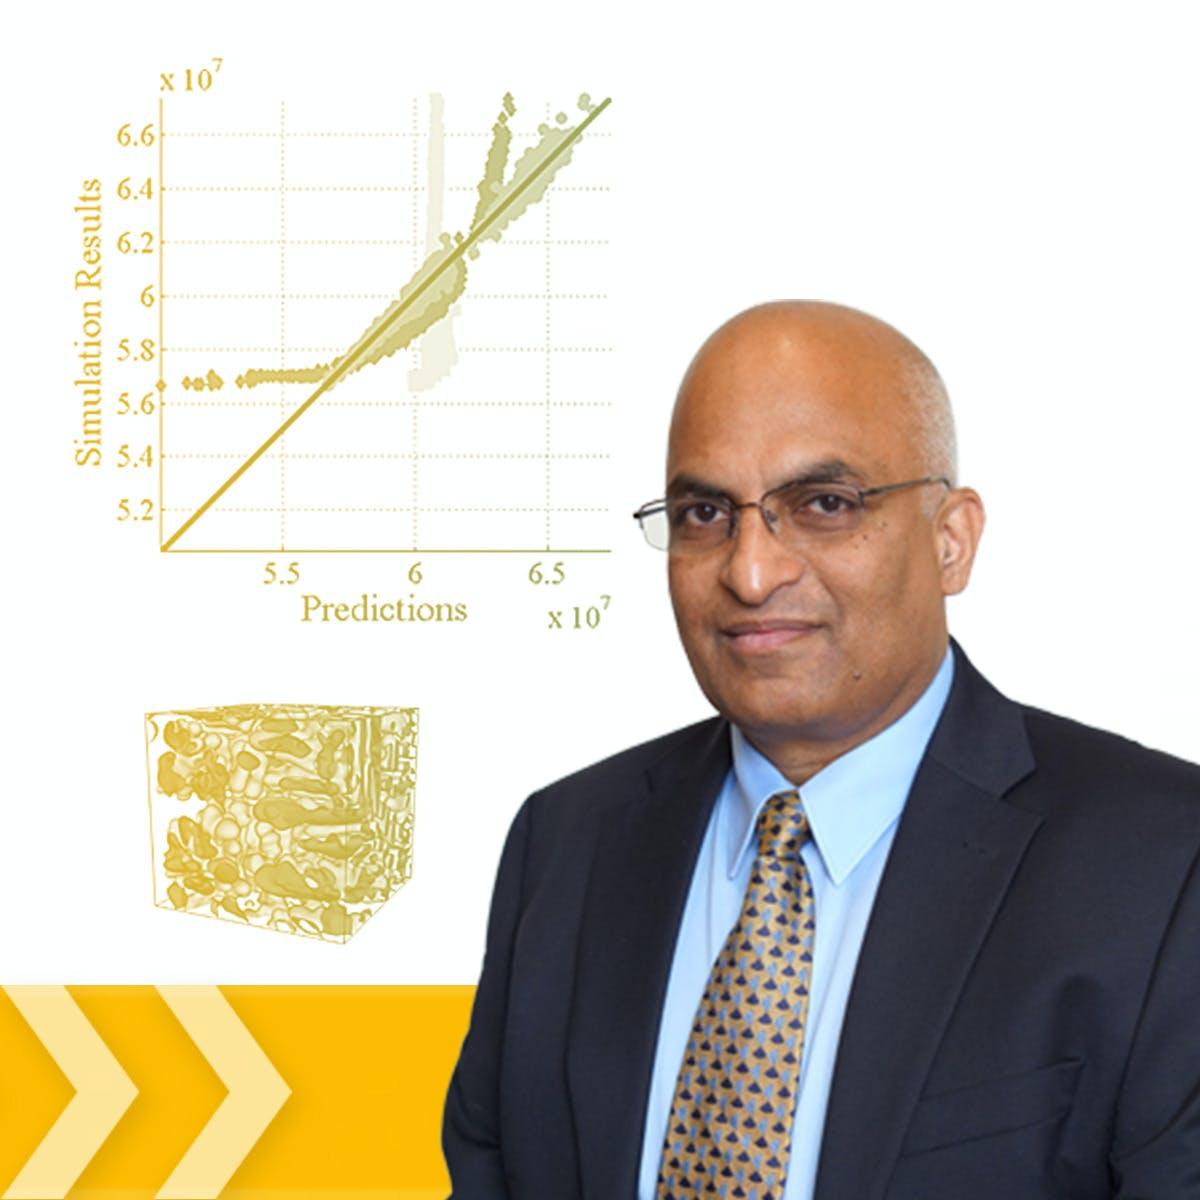 Materials Data Sciences and Informatics